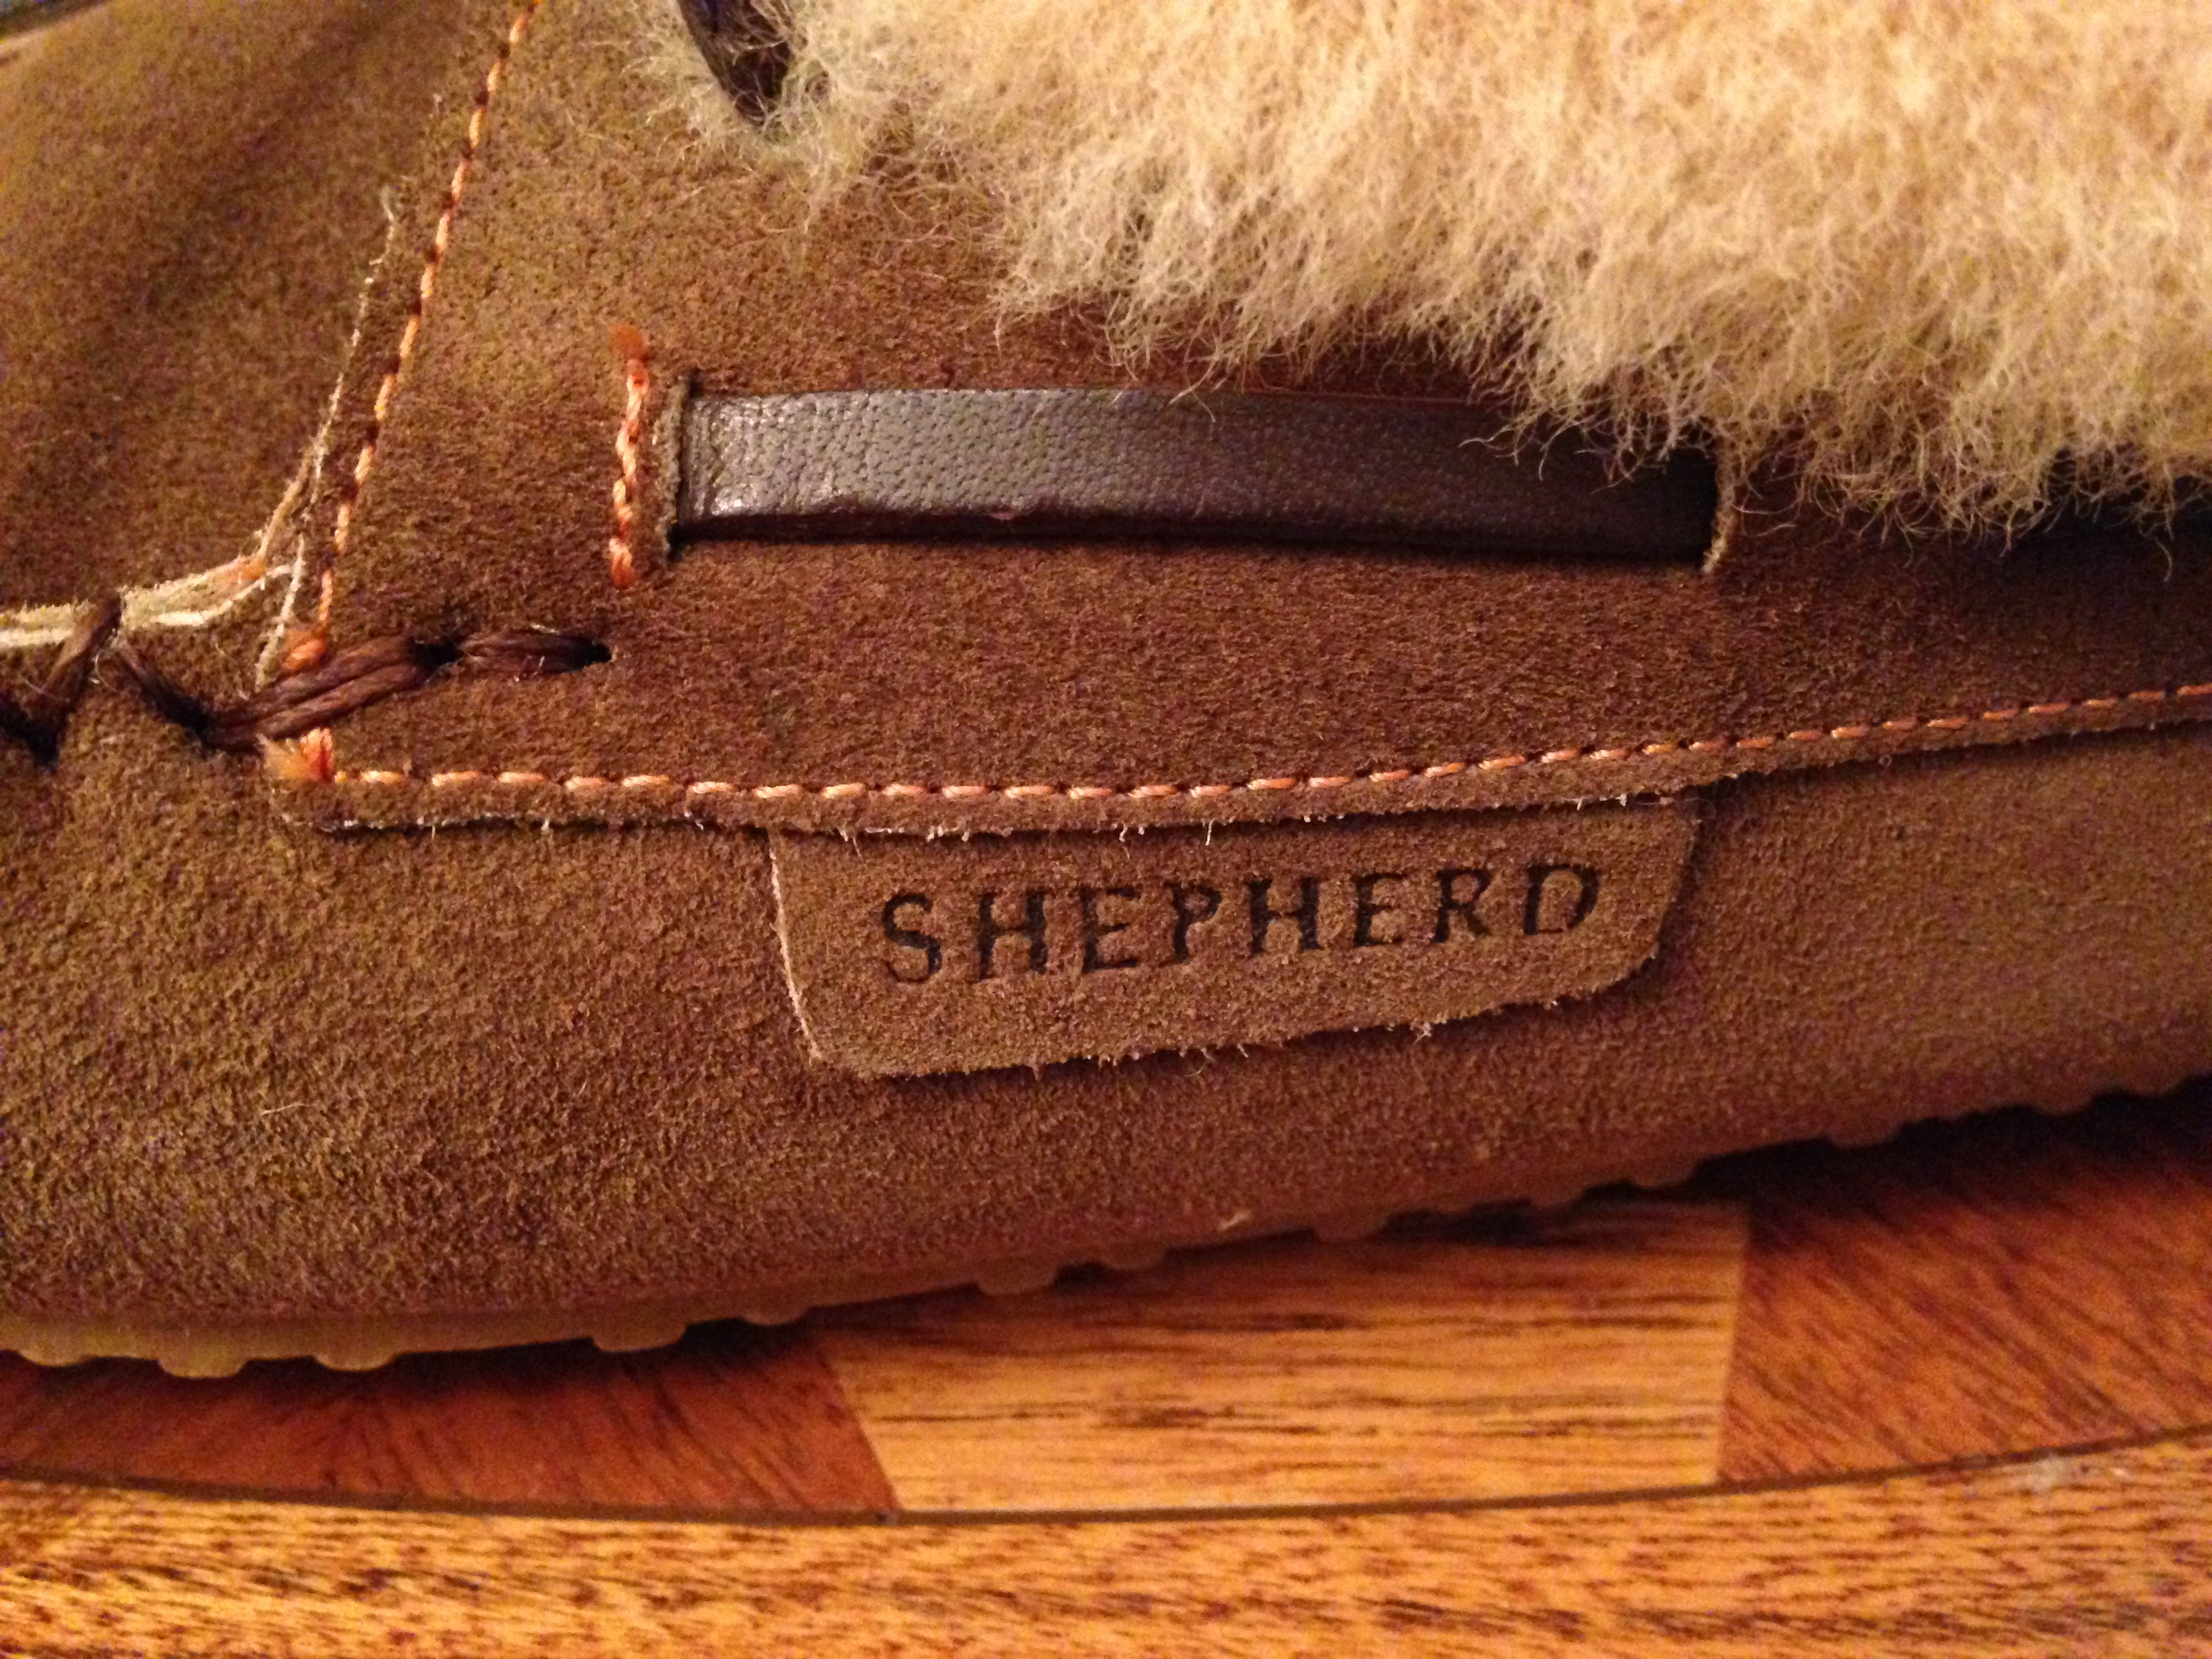 Shepherd tøffel Miranda